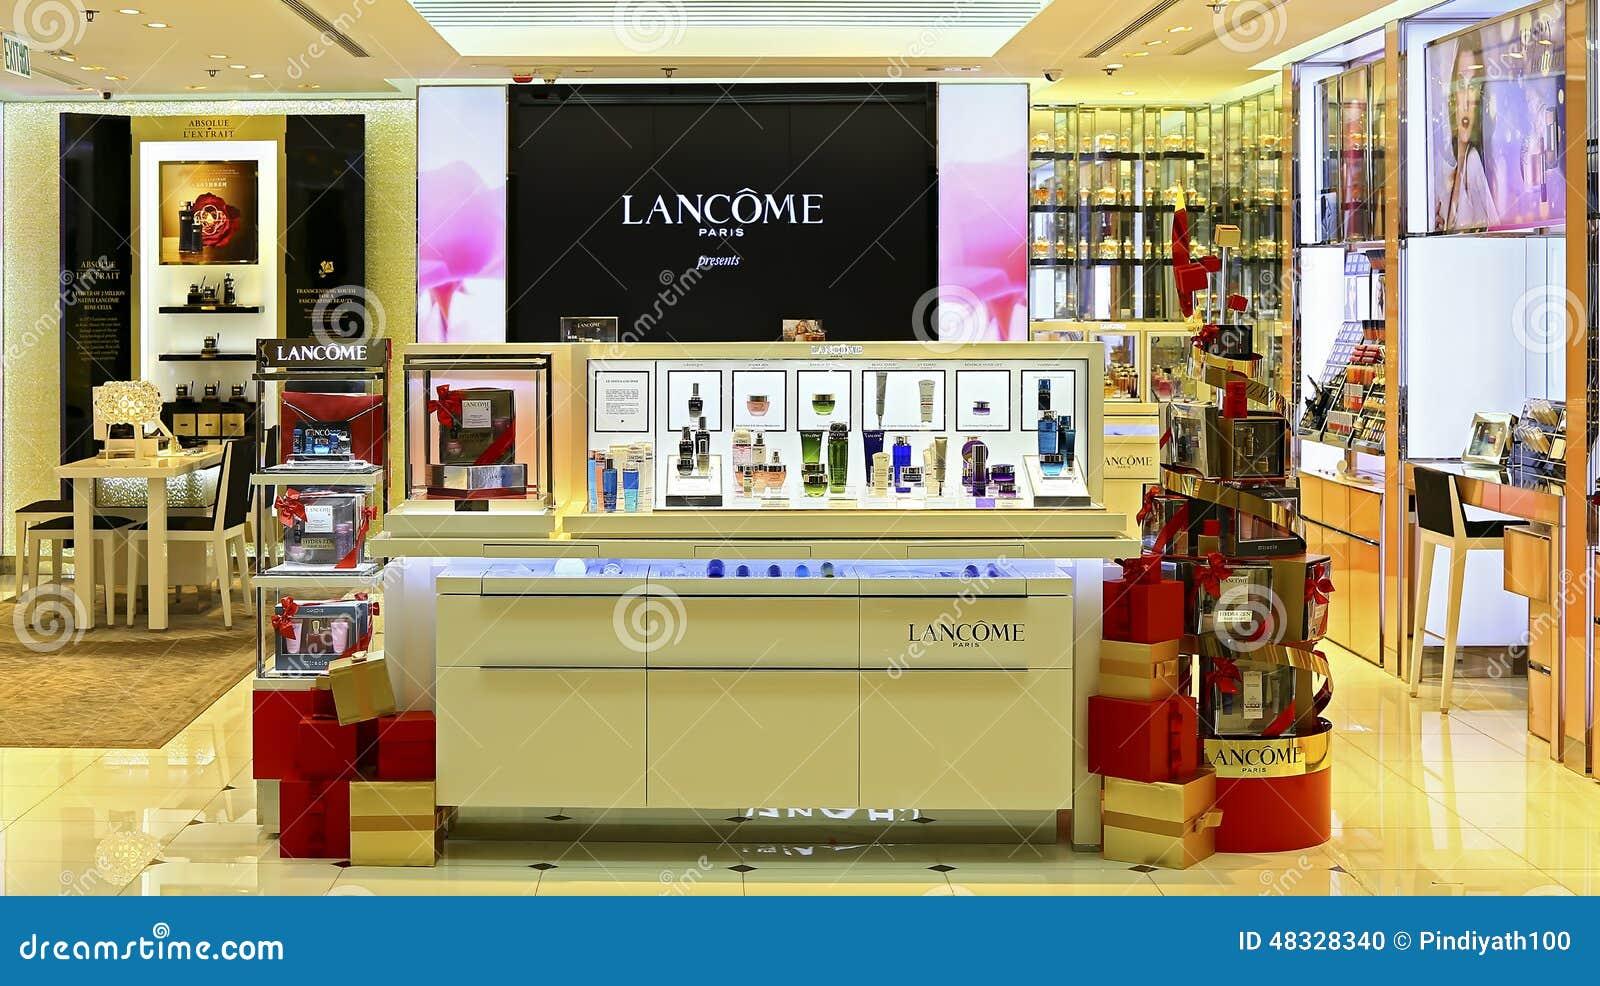 Lancome Beauty Care Pr...